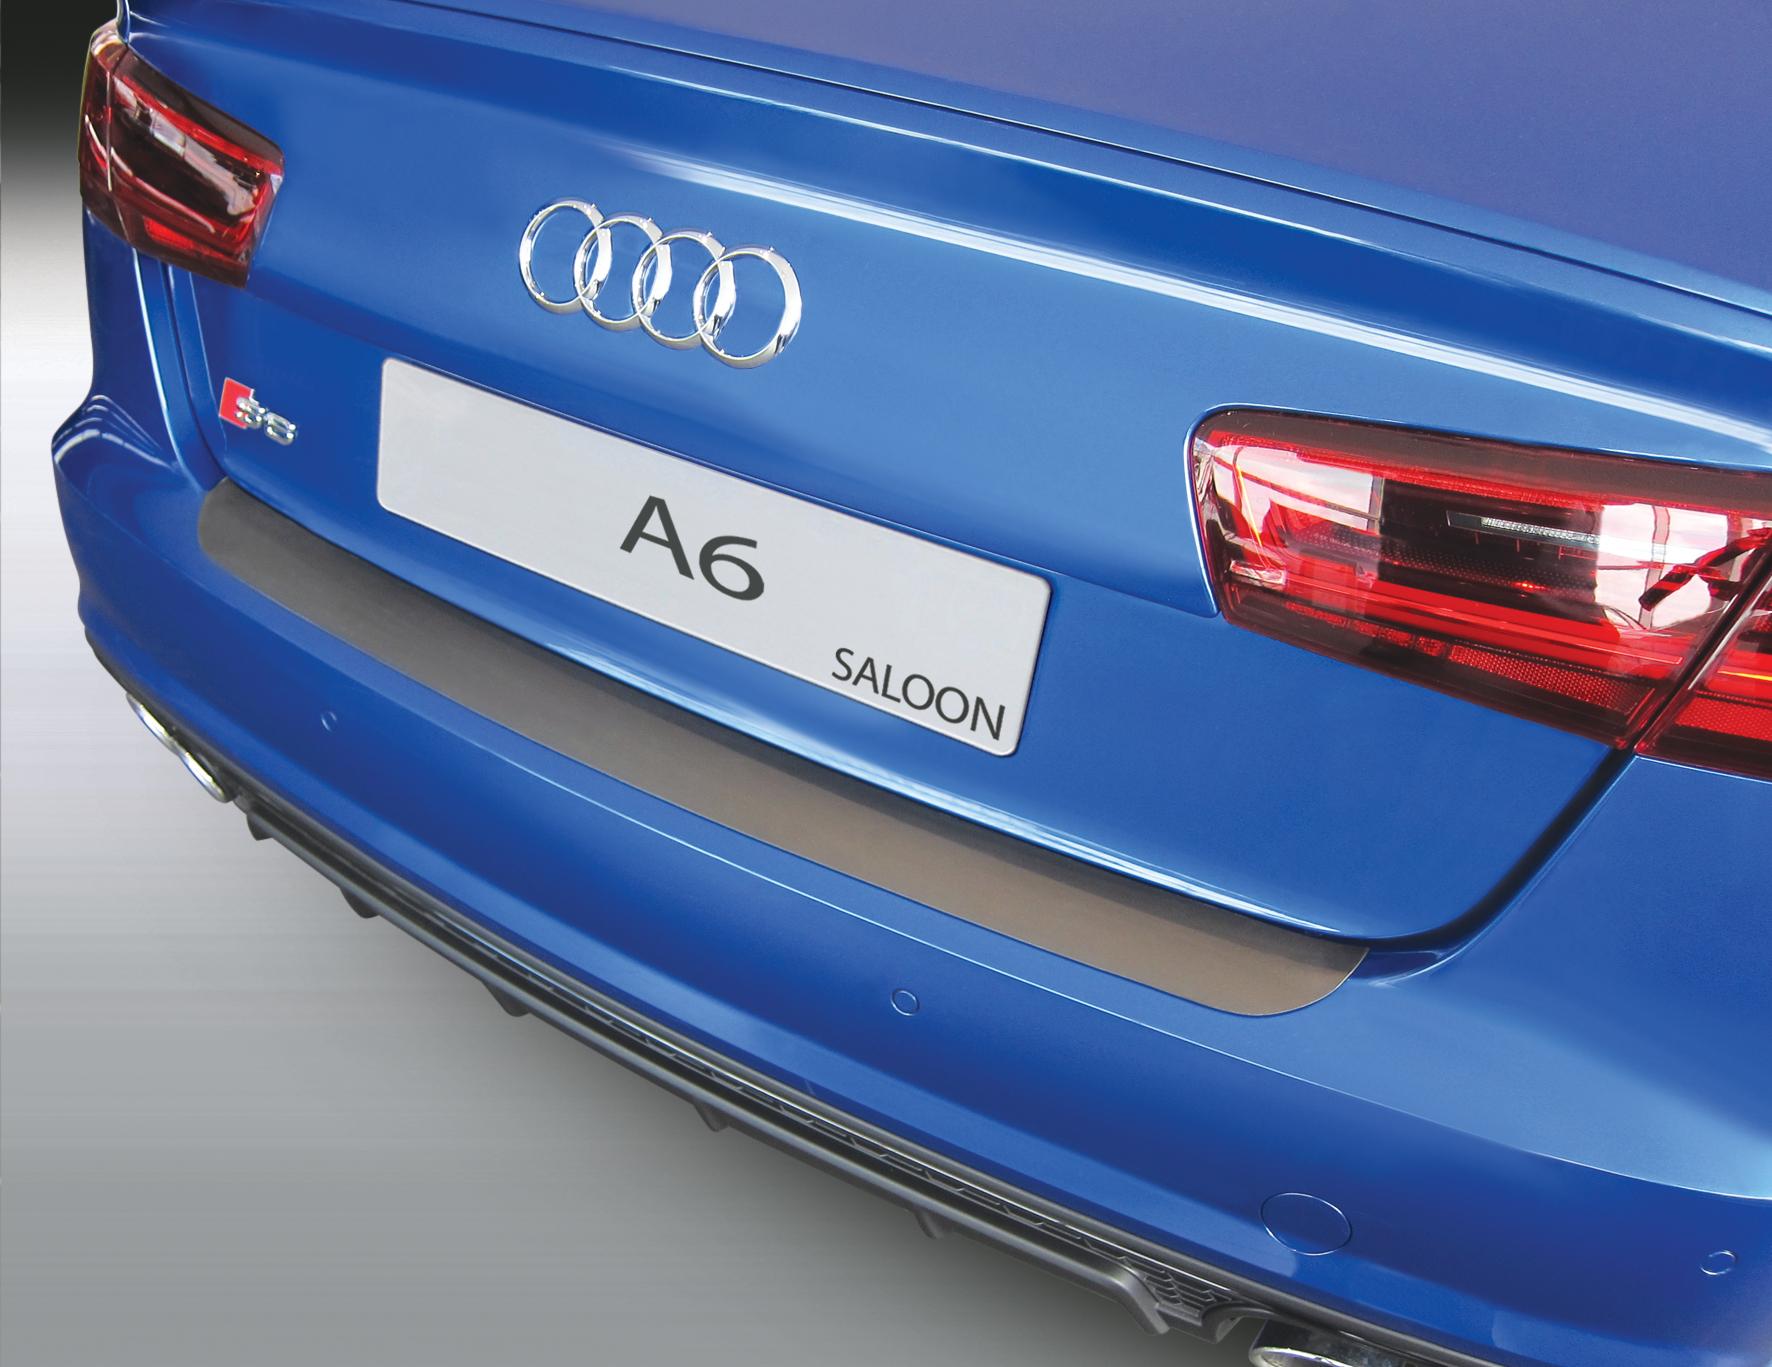 Накладка на задний бампер Audi A6 / S6, седан, 2016-2018